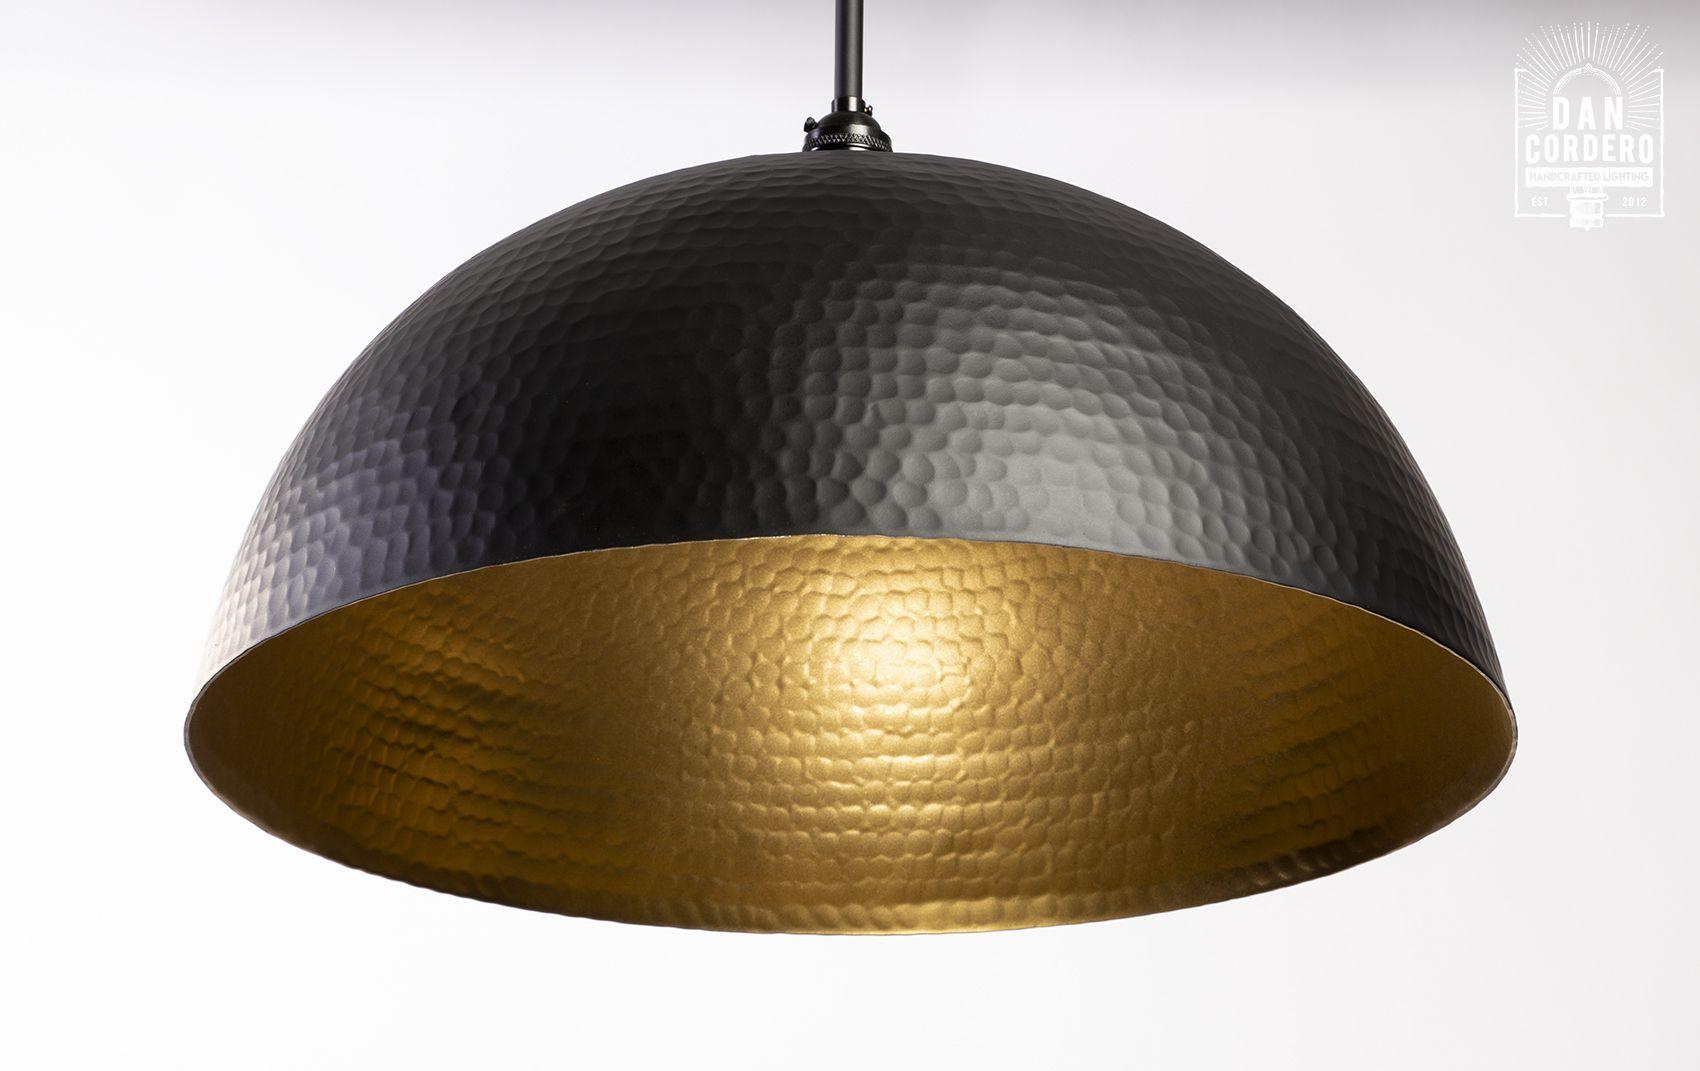 Hammered Flat Black Dome Pendant Light Fixture Oversized Pendant